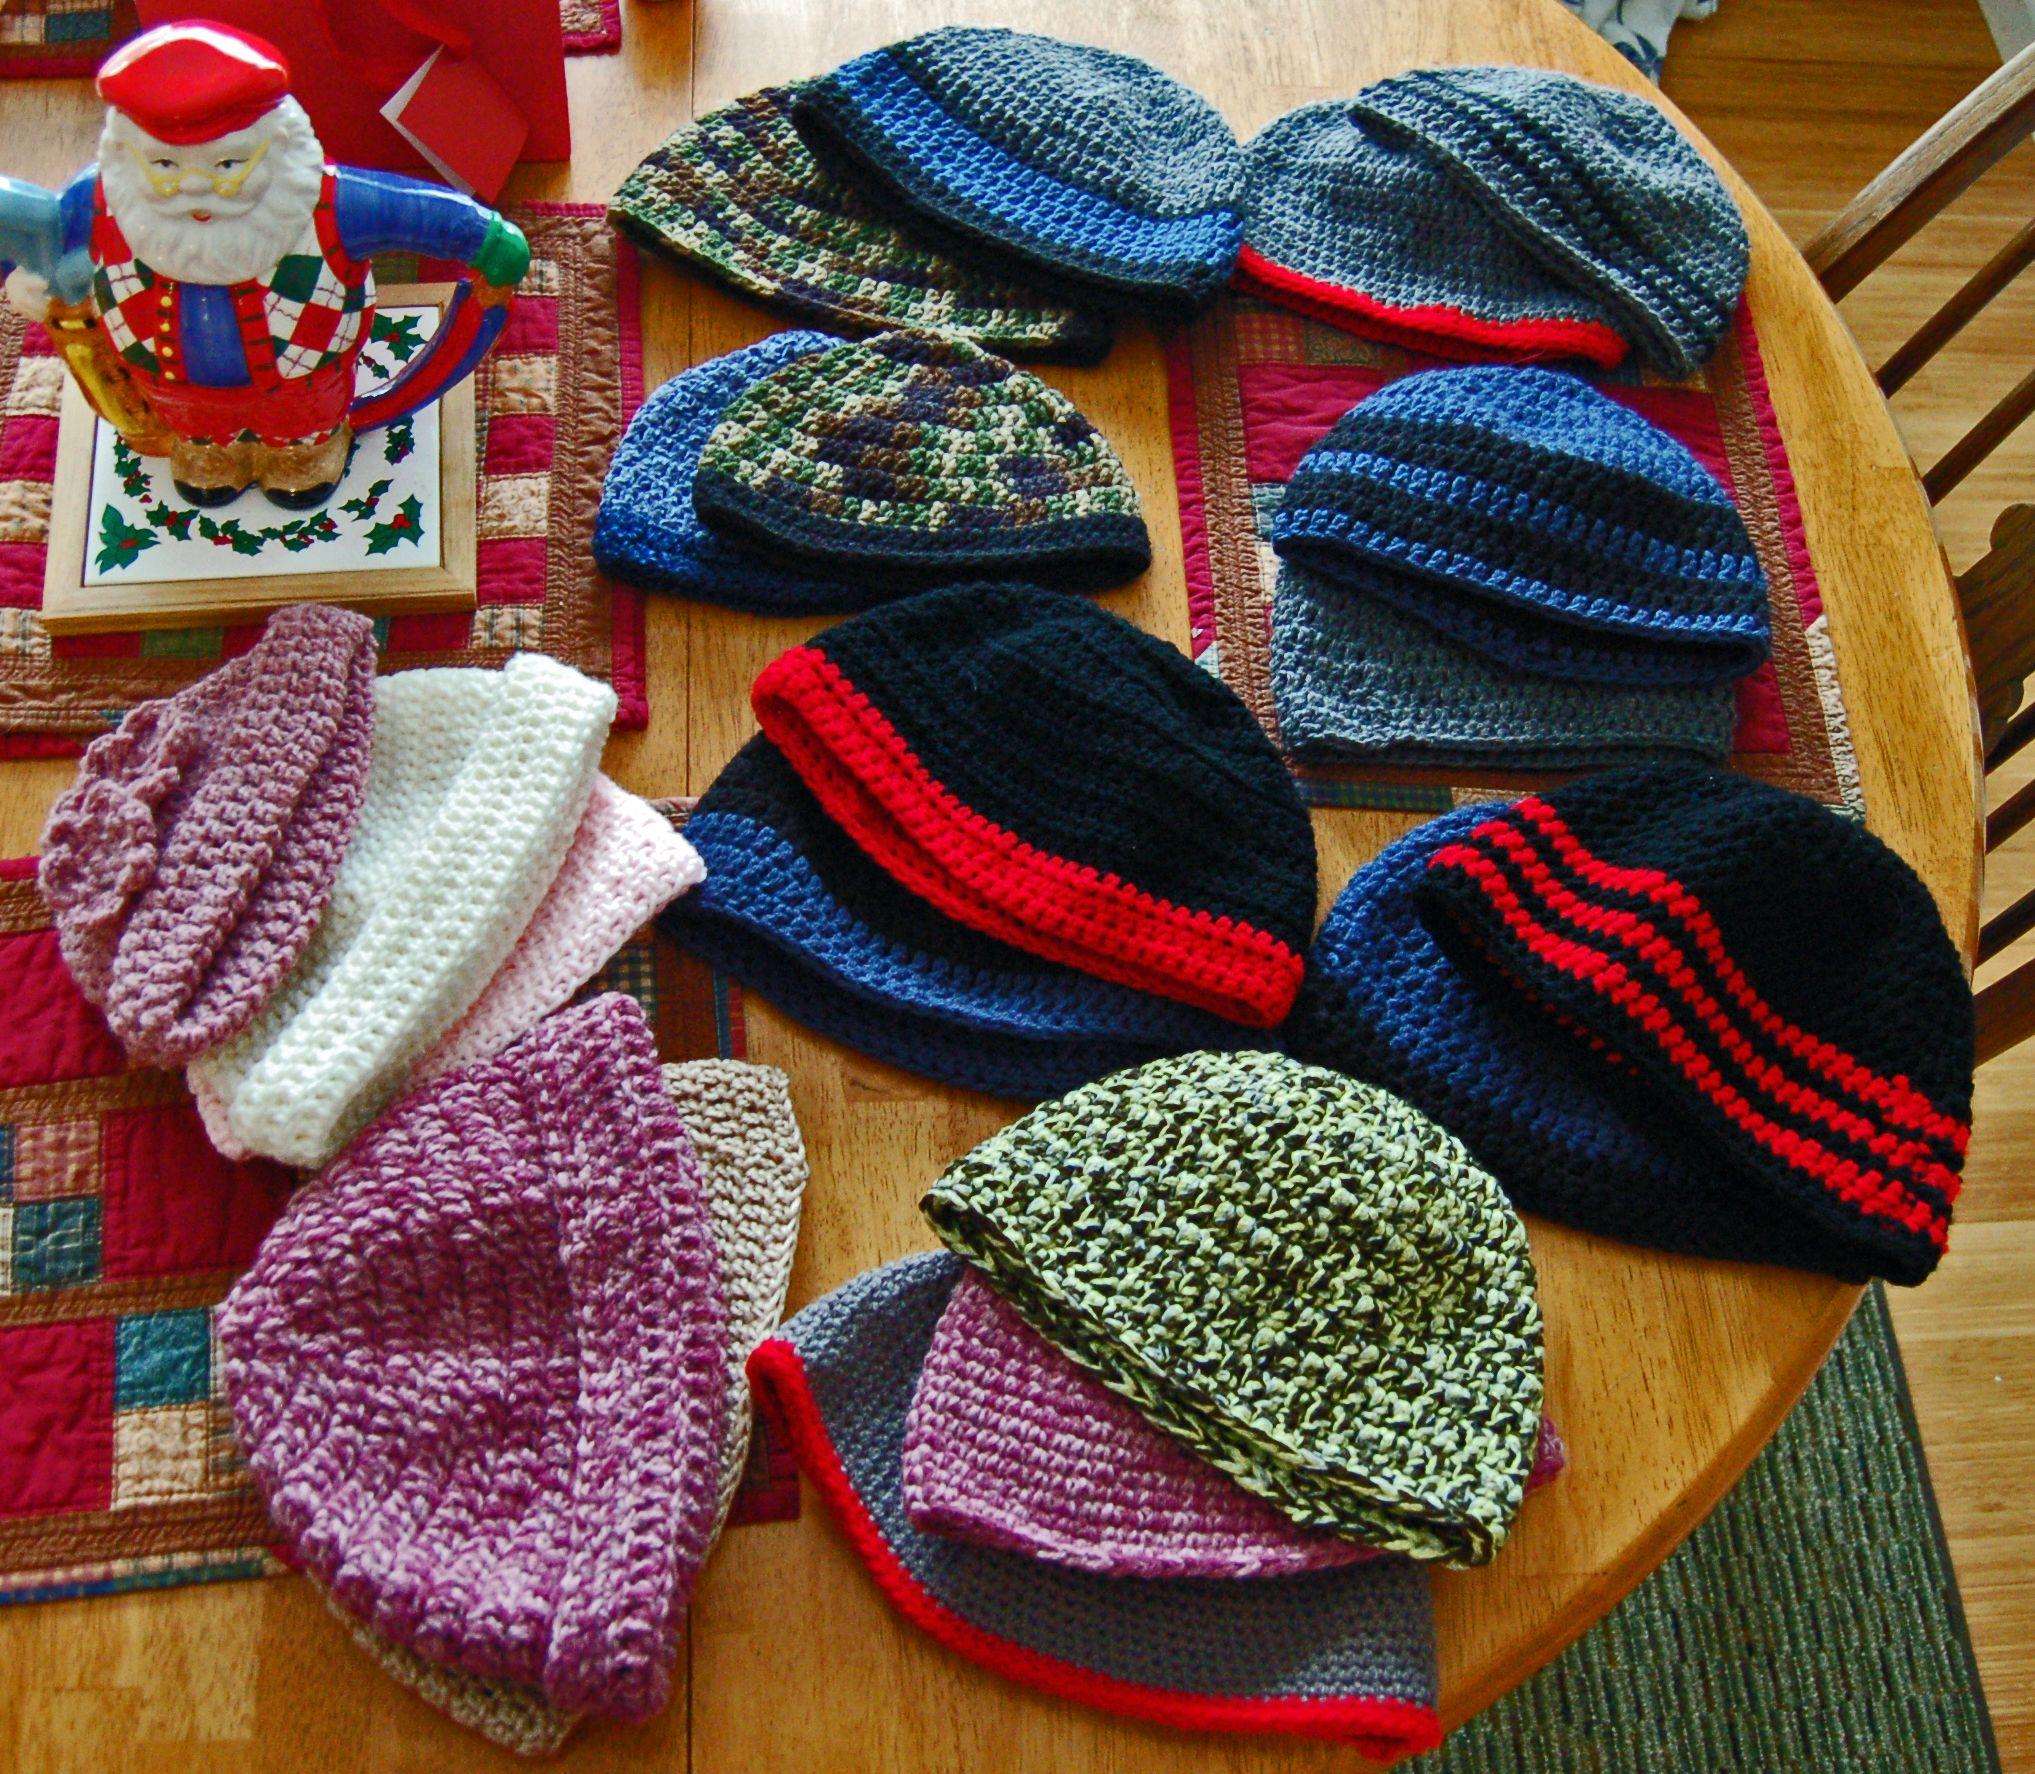 Crochet Skull Cap : Crocheted Skull Caps Crochet Pinterest